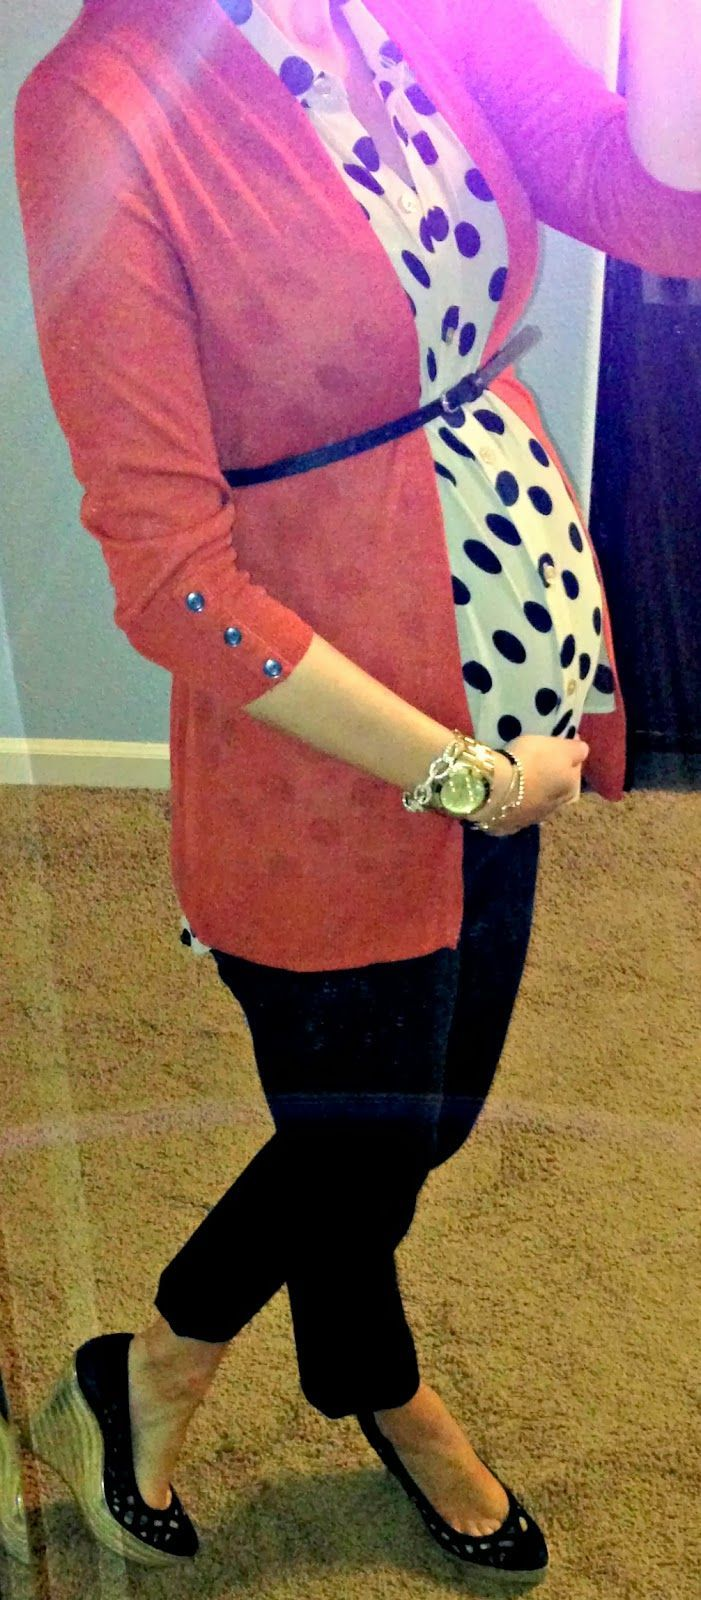 Katie's Closet, maternity fashion, maternity style, pregnancy fashion, pregnancy style---for the next one :)